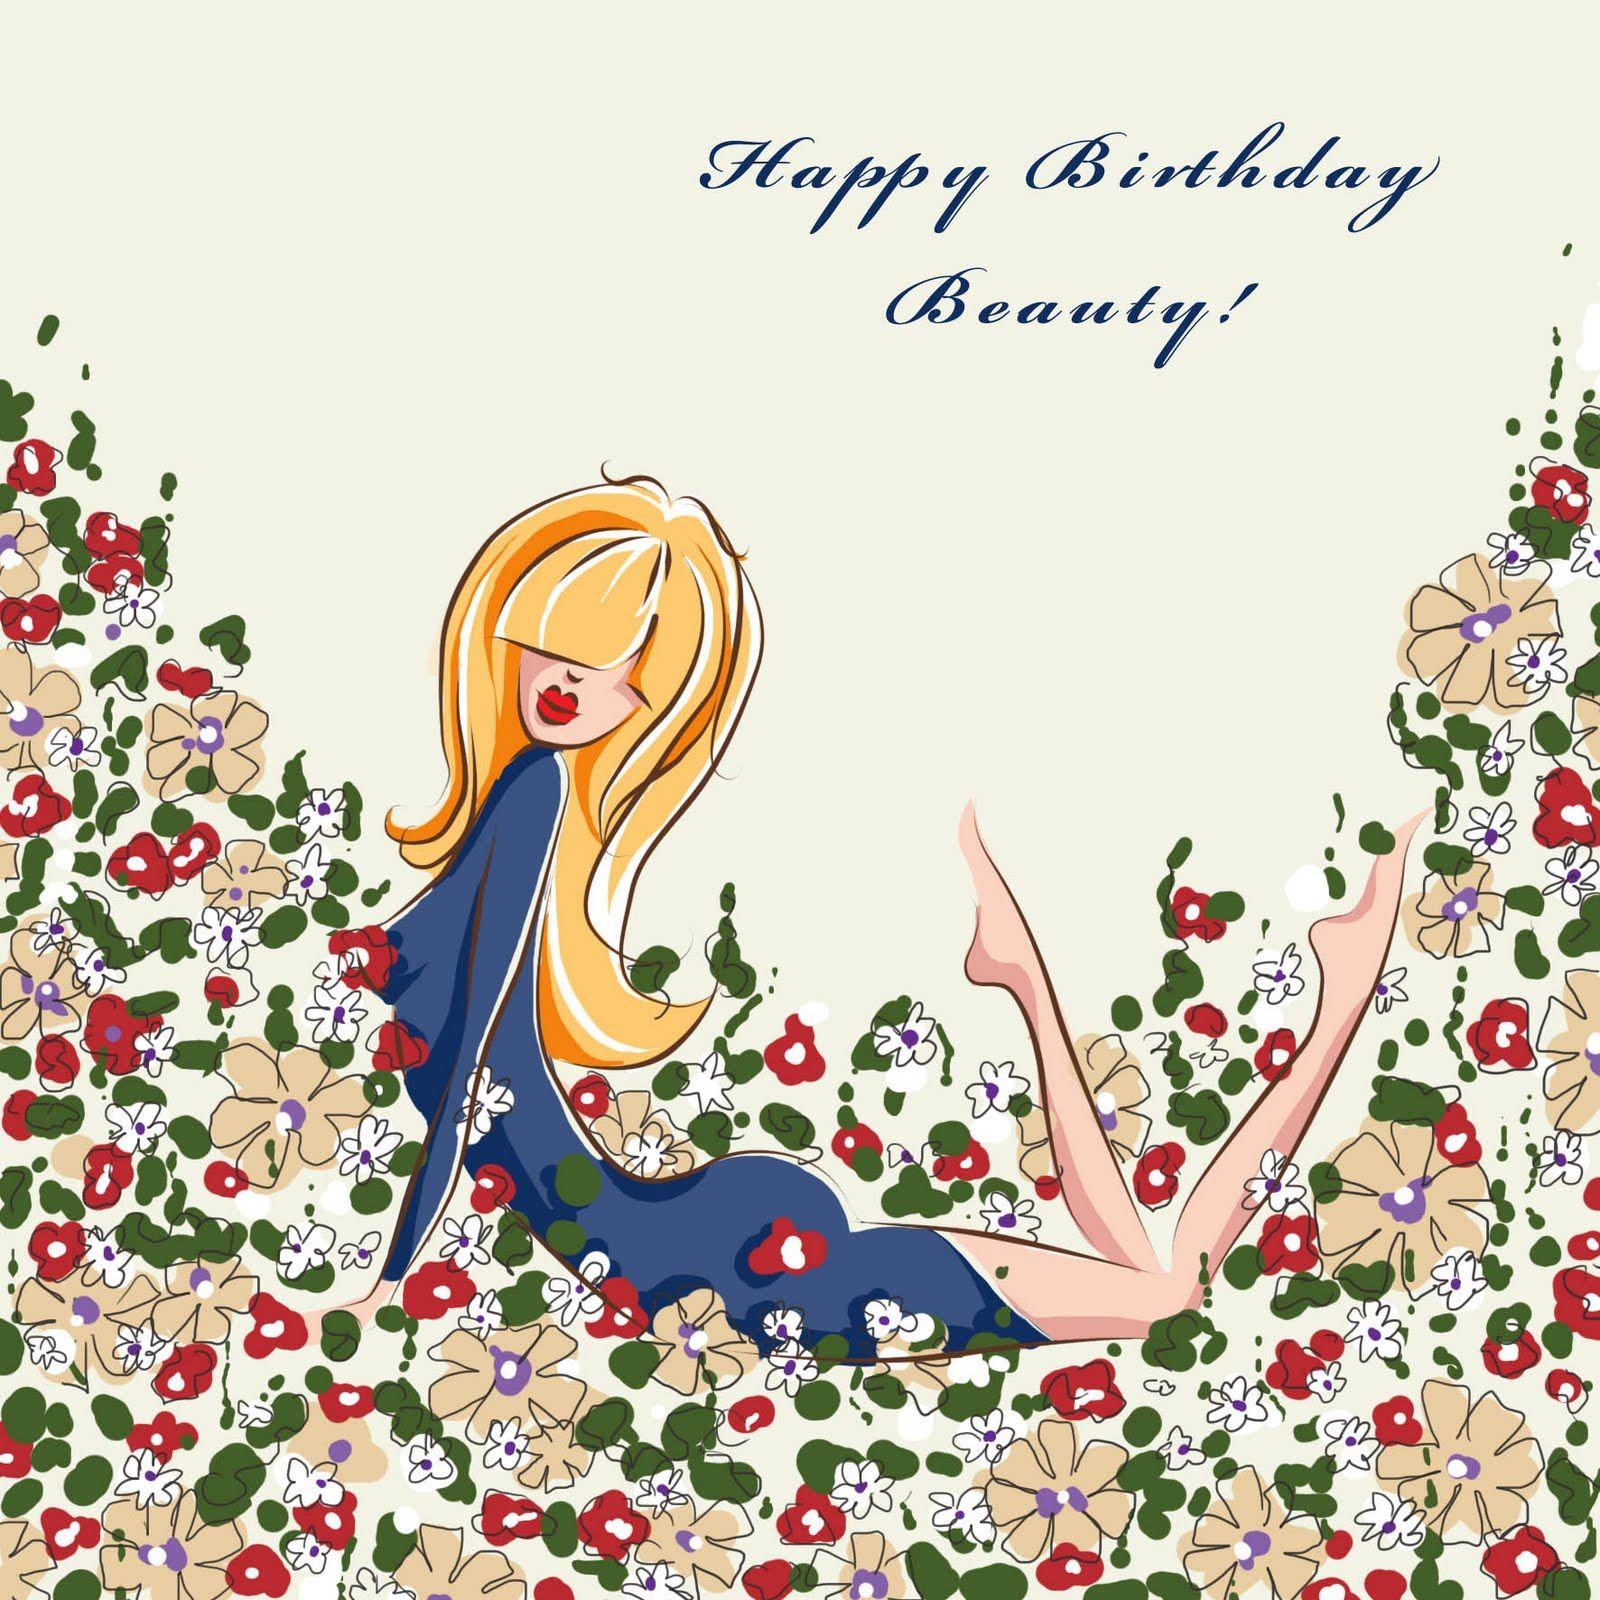 Happy Birthday Beautiful Girl The Card Was Pretty Much